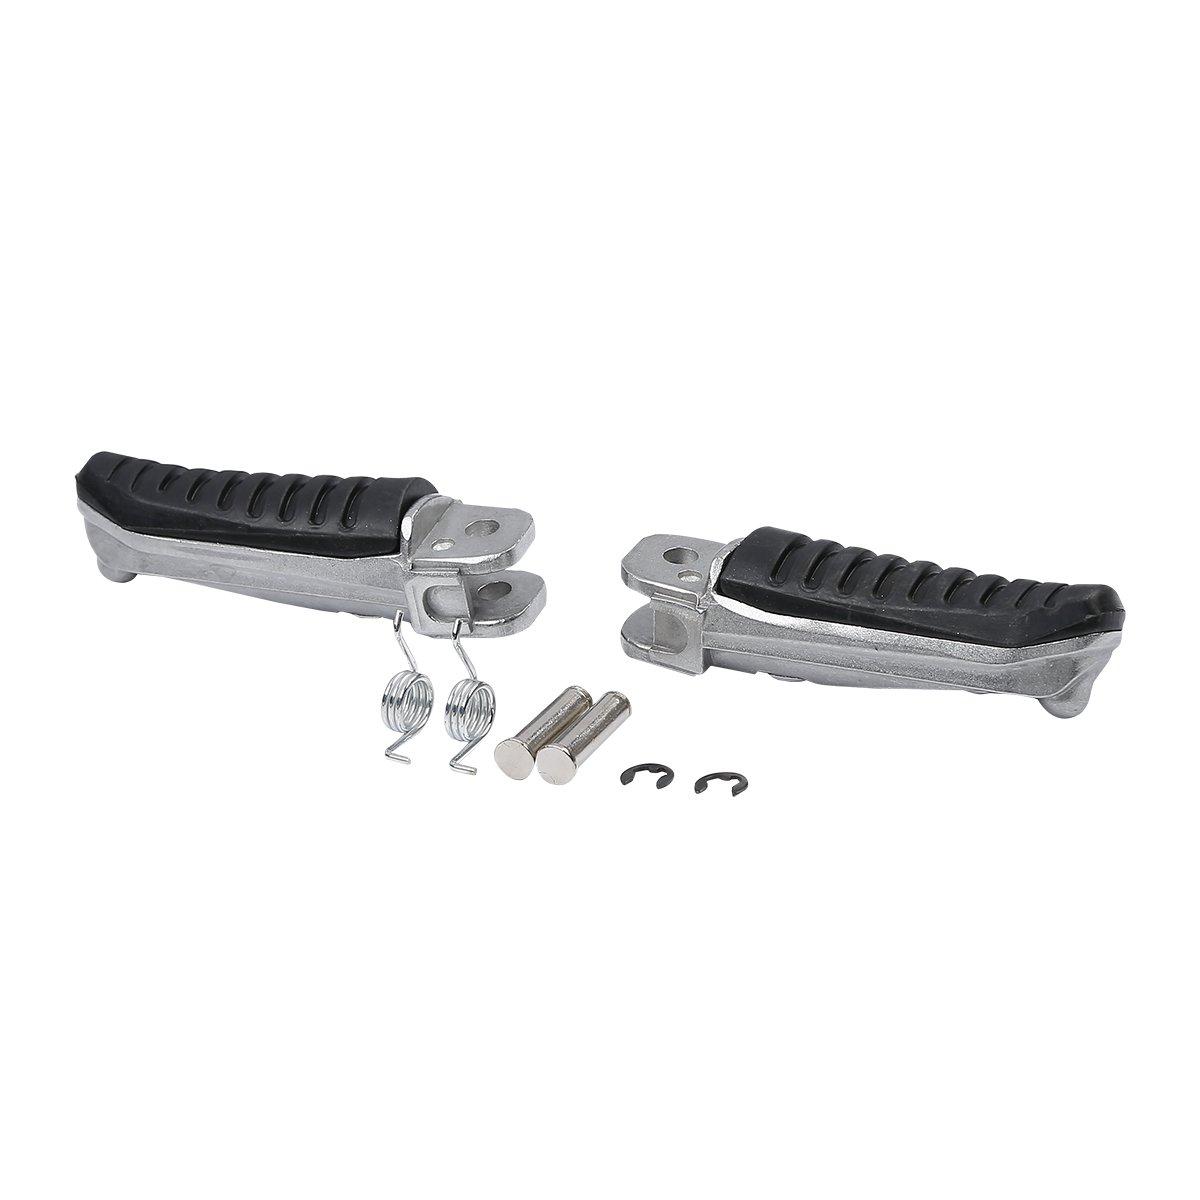 XMT-MOTOR Negro Frente Reposapi/és Estriberas Clavijas para pies Pedales footrest para Bandit 400 GSF400 GK75A GSX400 91-97 GSF1200 Bandit 96-05 GSF600 96-00